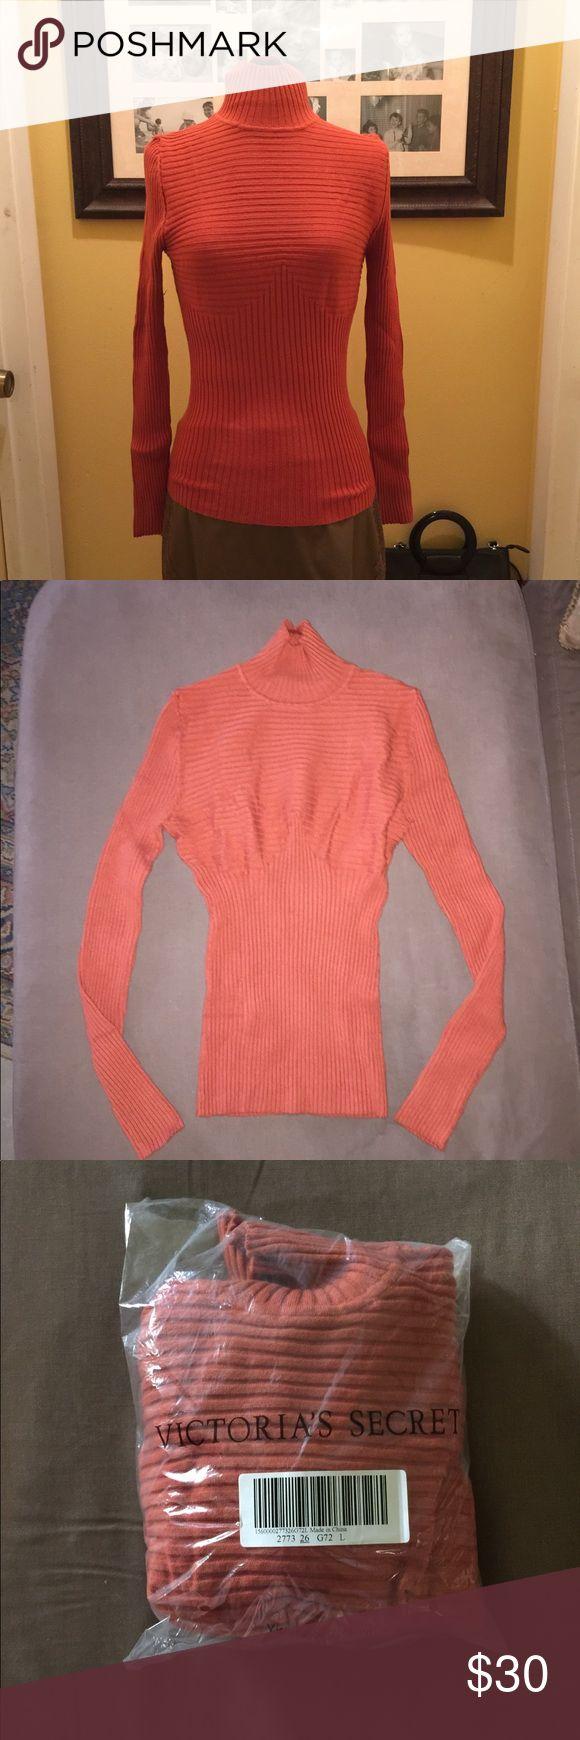 NWT VS Orange Turtleneck Sweater Sz L New in package orange turtleneck sweater from Victoria's Secret. Sz Large. Label states Moda International which is a manufacturer for VS. Victoria's Secret Sweaters Cowl & Turtlenecks